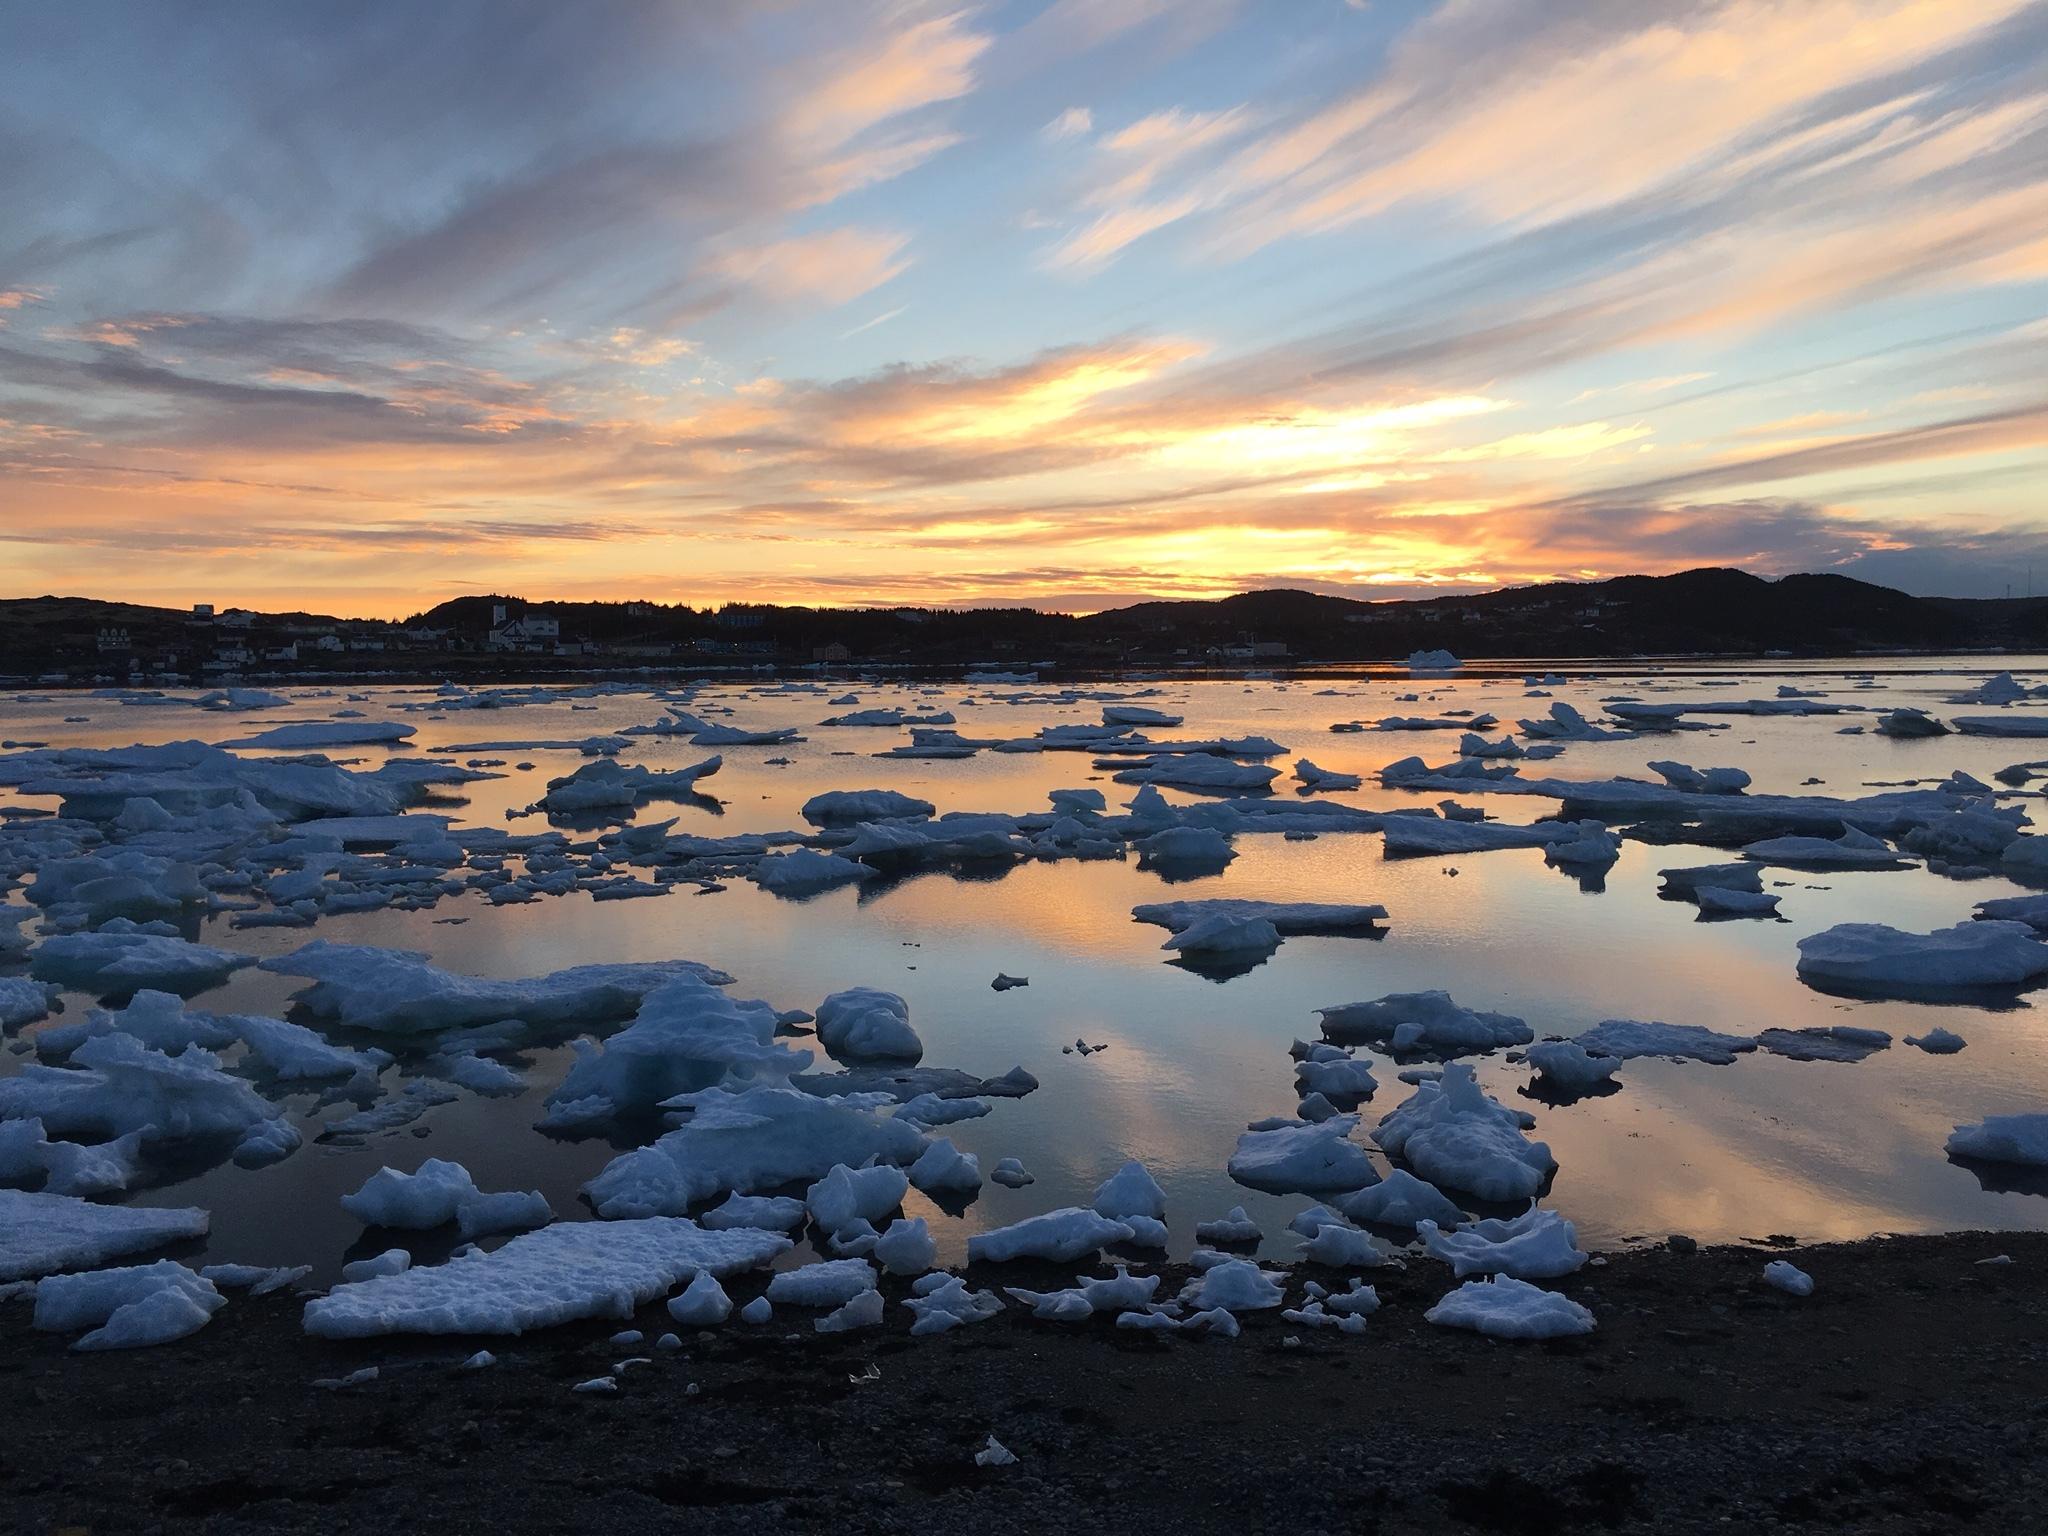 The iceberg laden springtime sea near The Wild's Coral Cabin